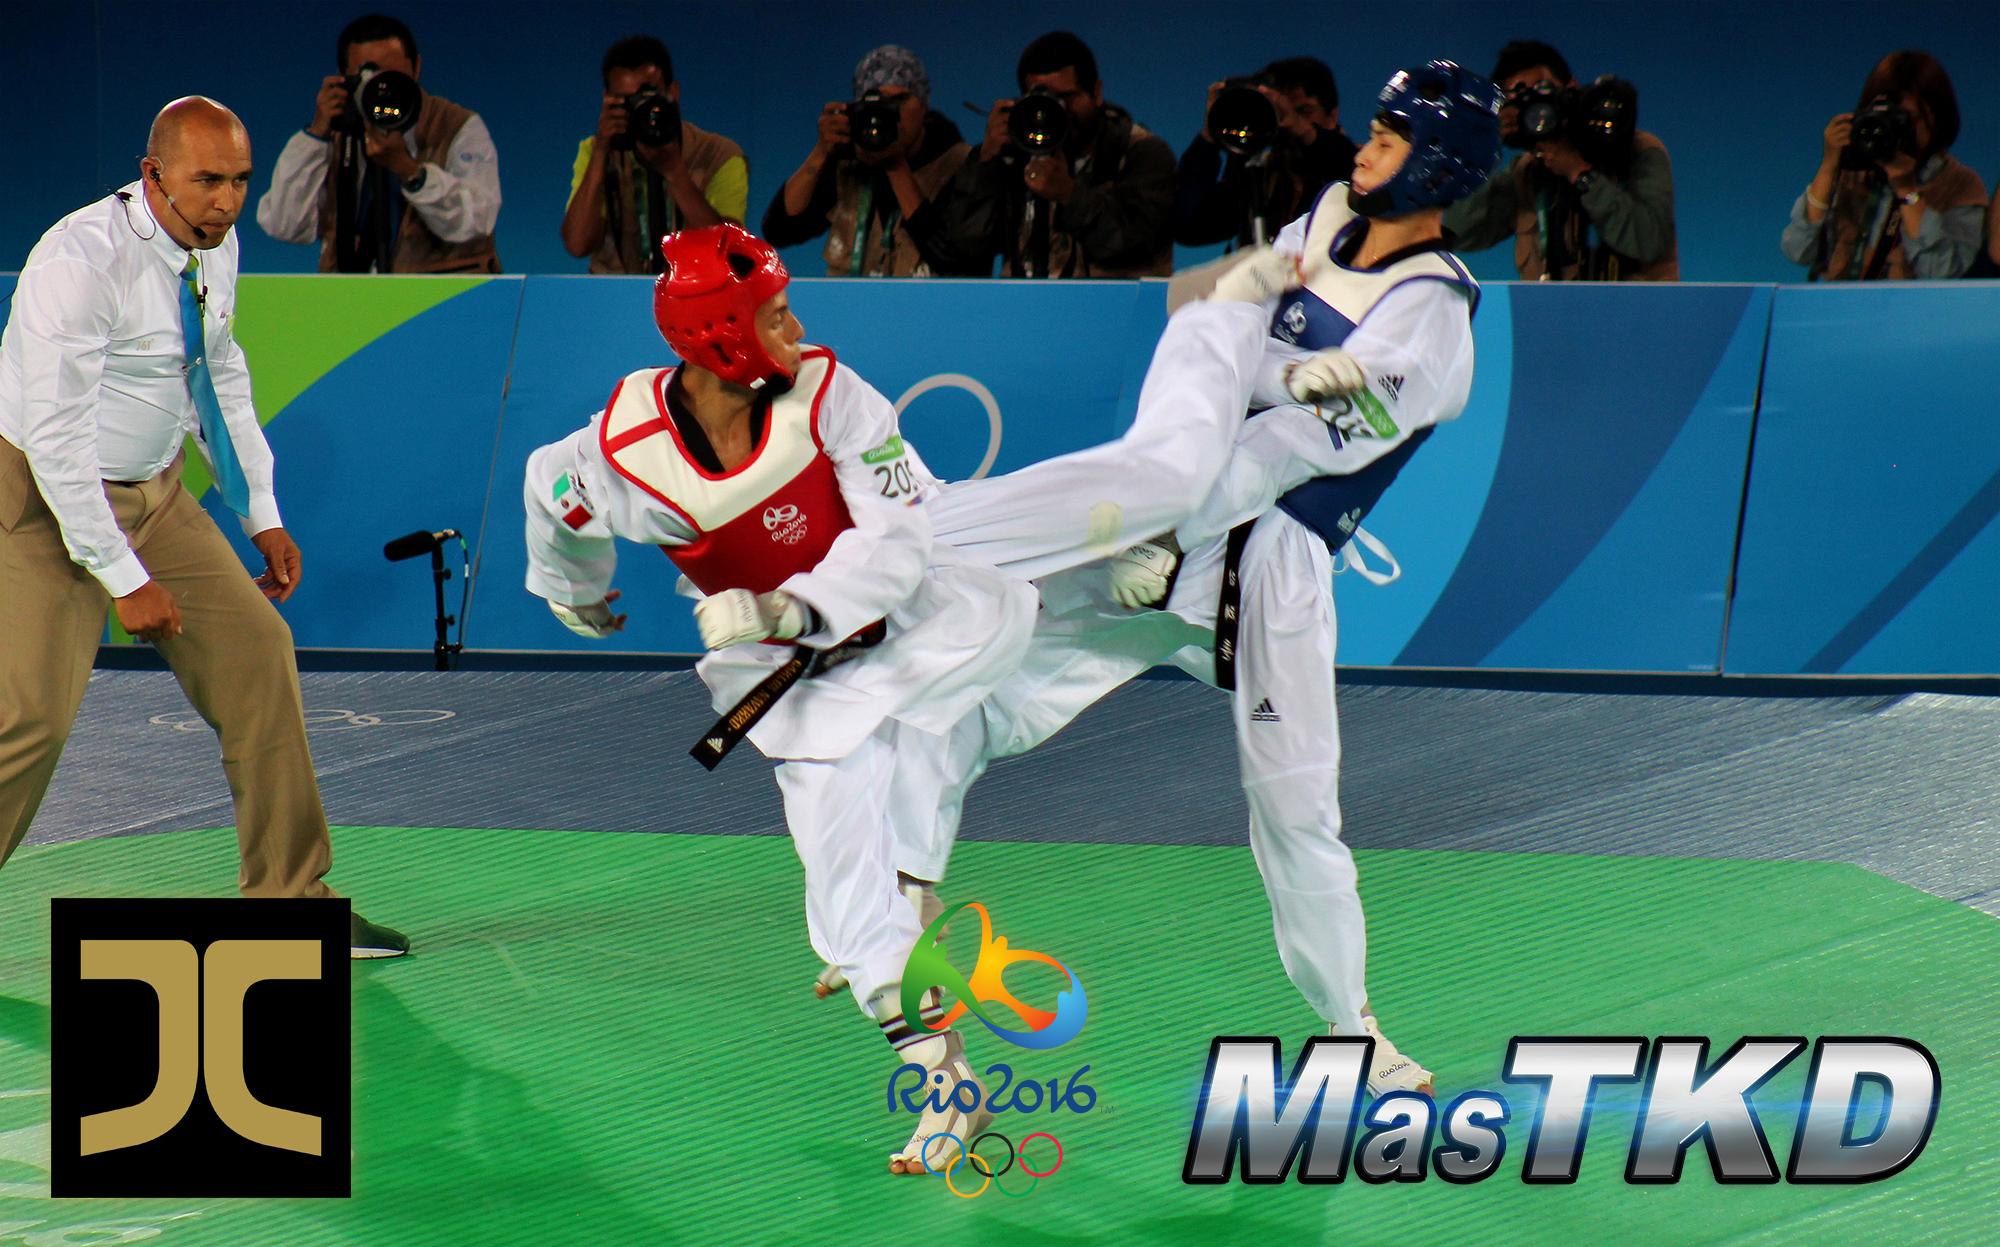 20160817_Taekwondo_JC_masTKD_Rio2016_02